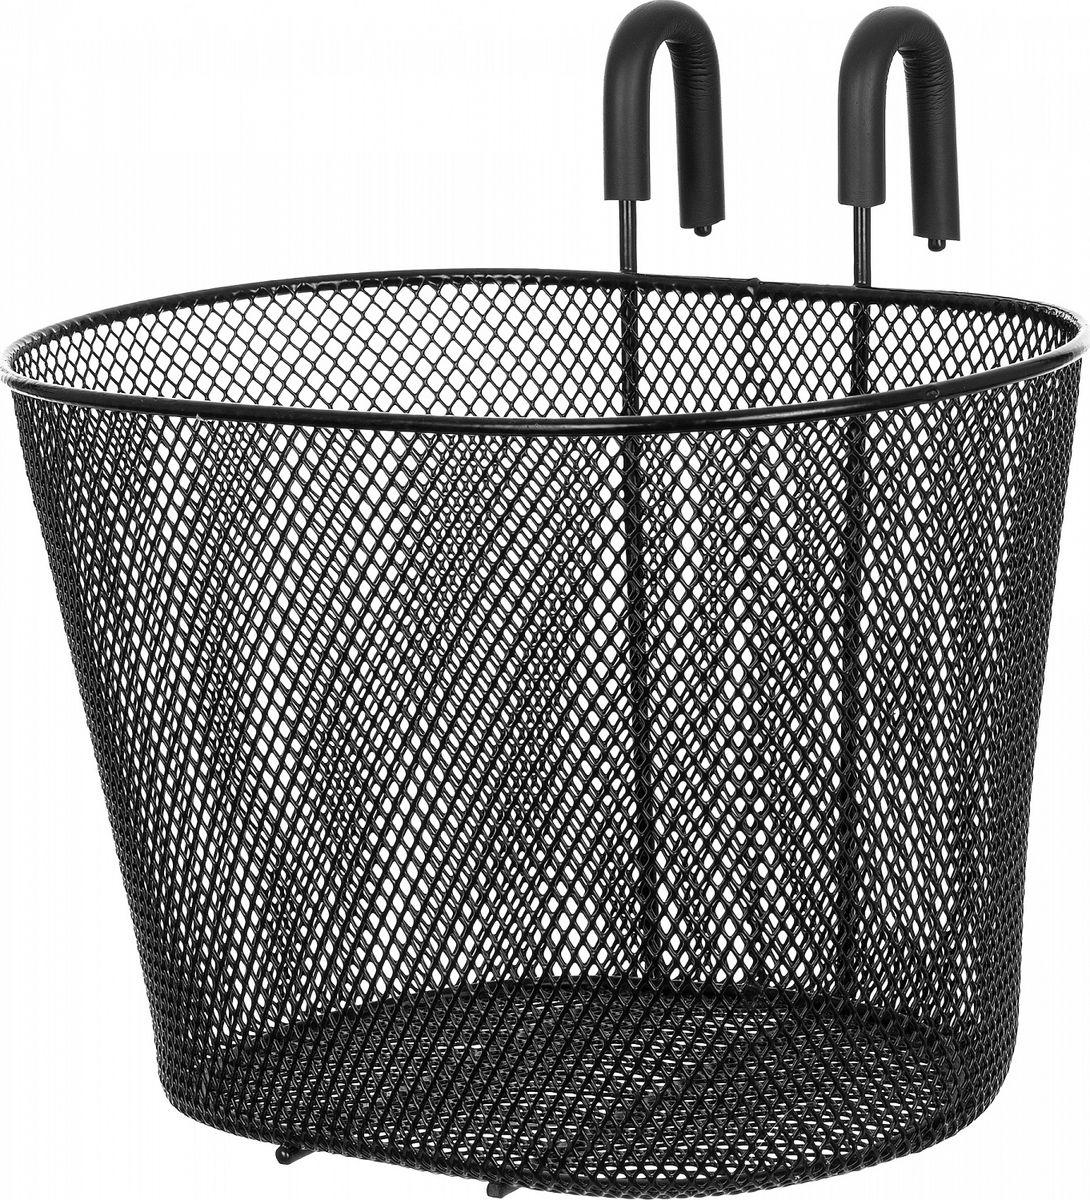 Велокорзина Stern Cheap Bicycle Basket, цвет: черный